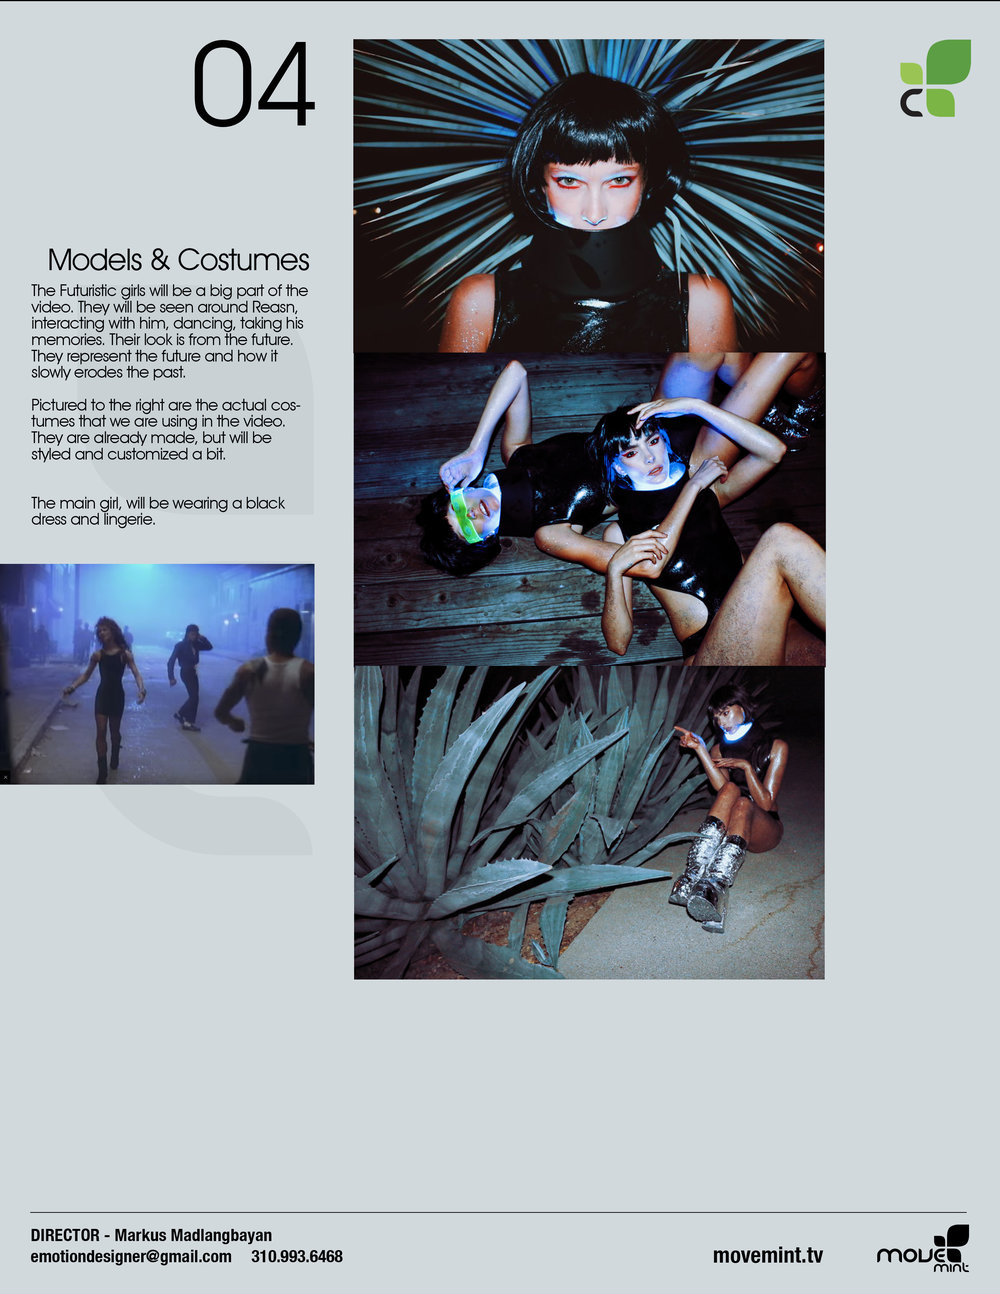 Reasn_Magic_Treatment_Page04_Models_v1.jpg